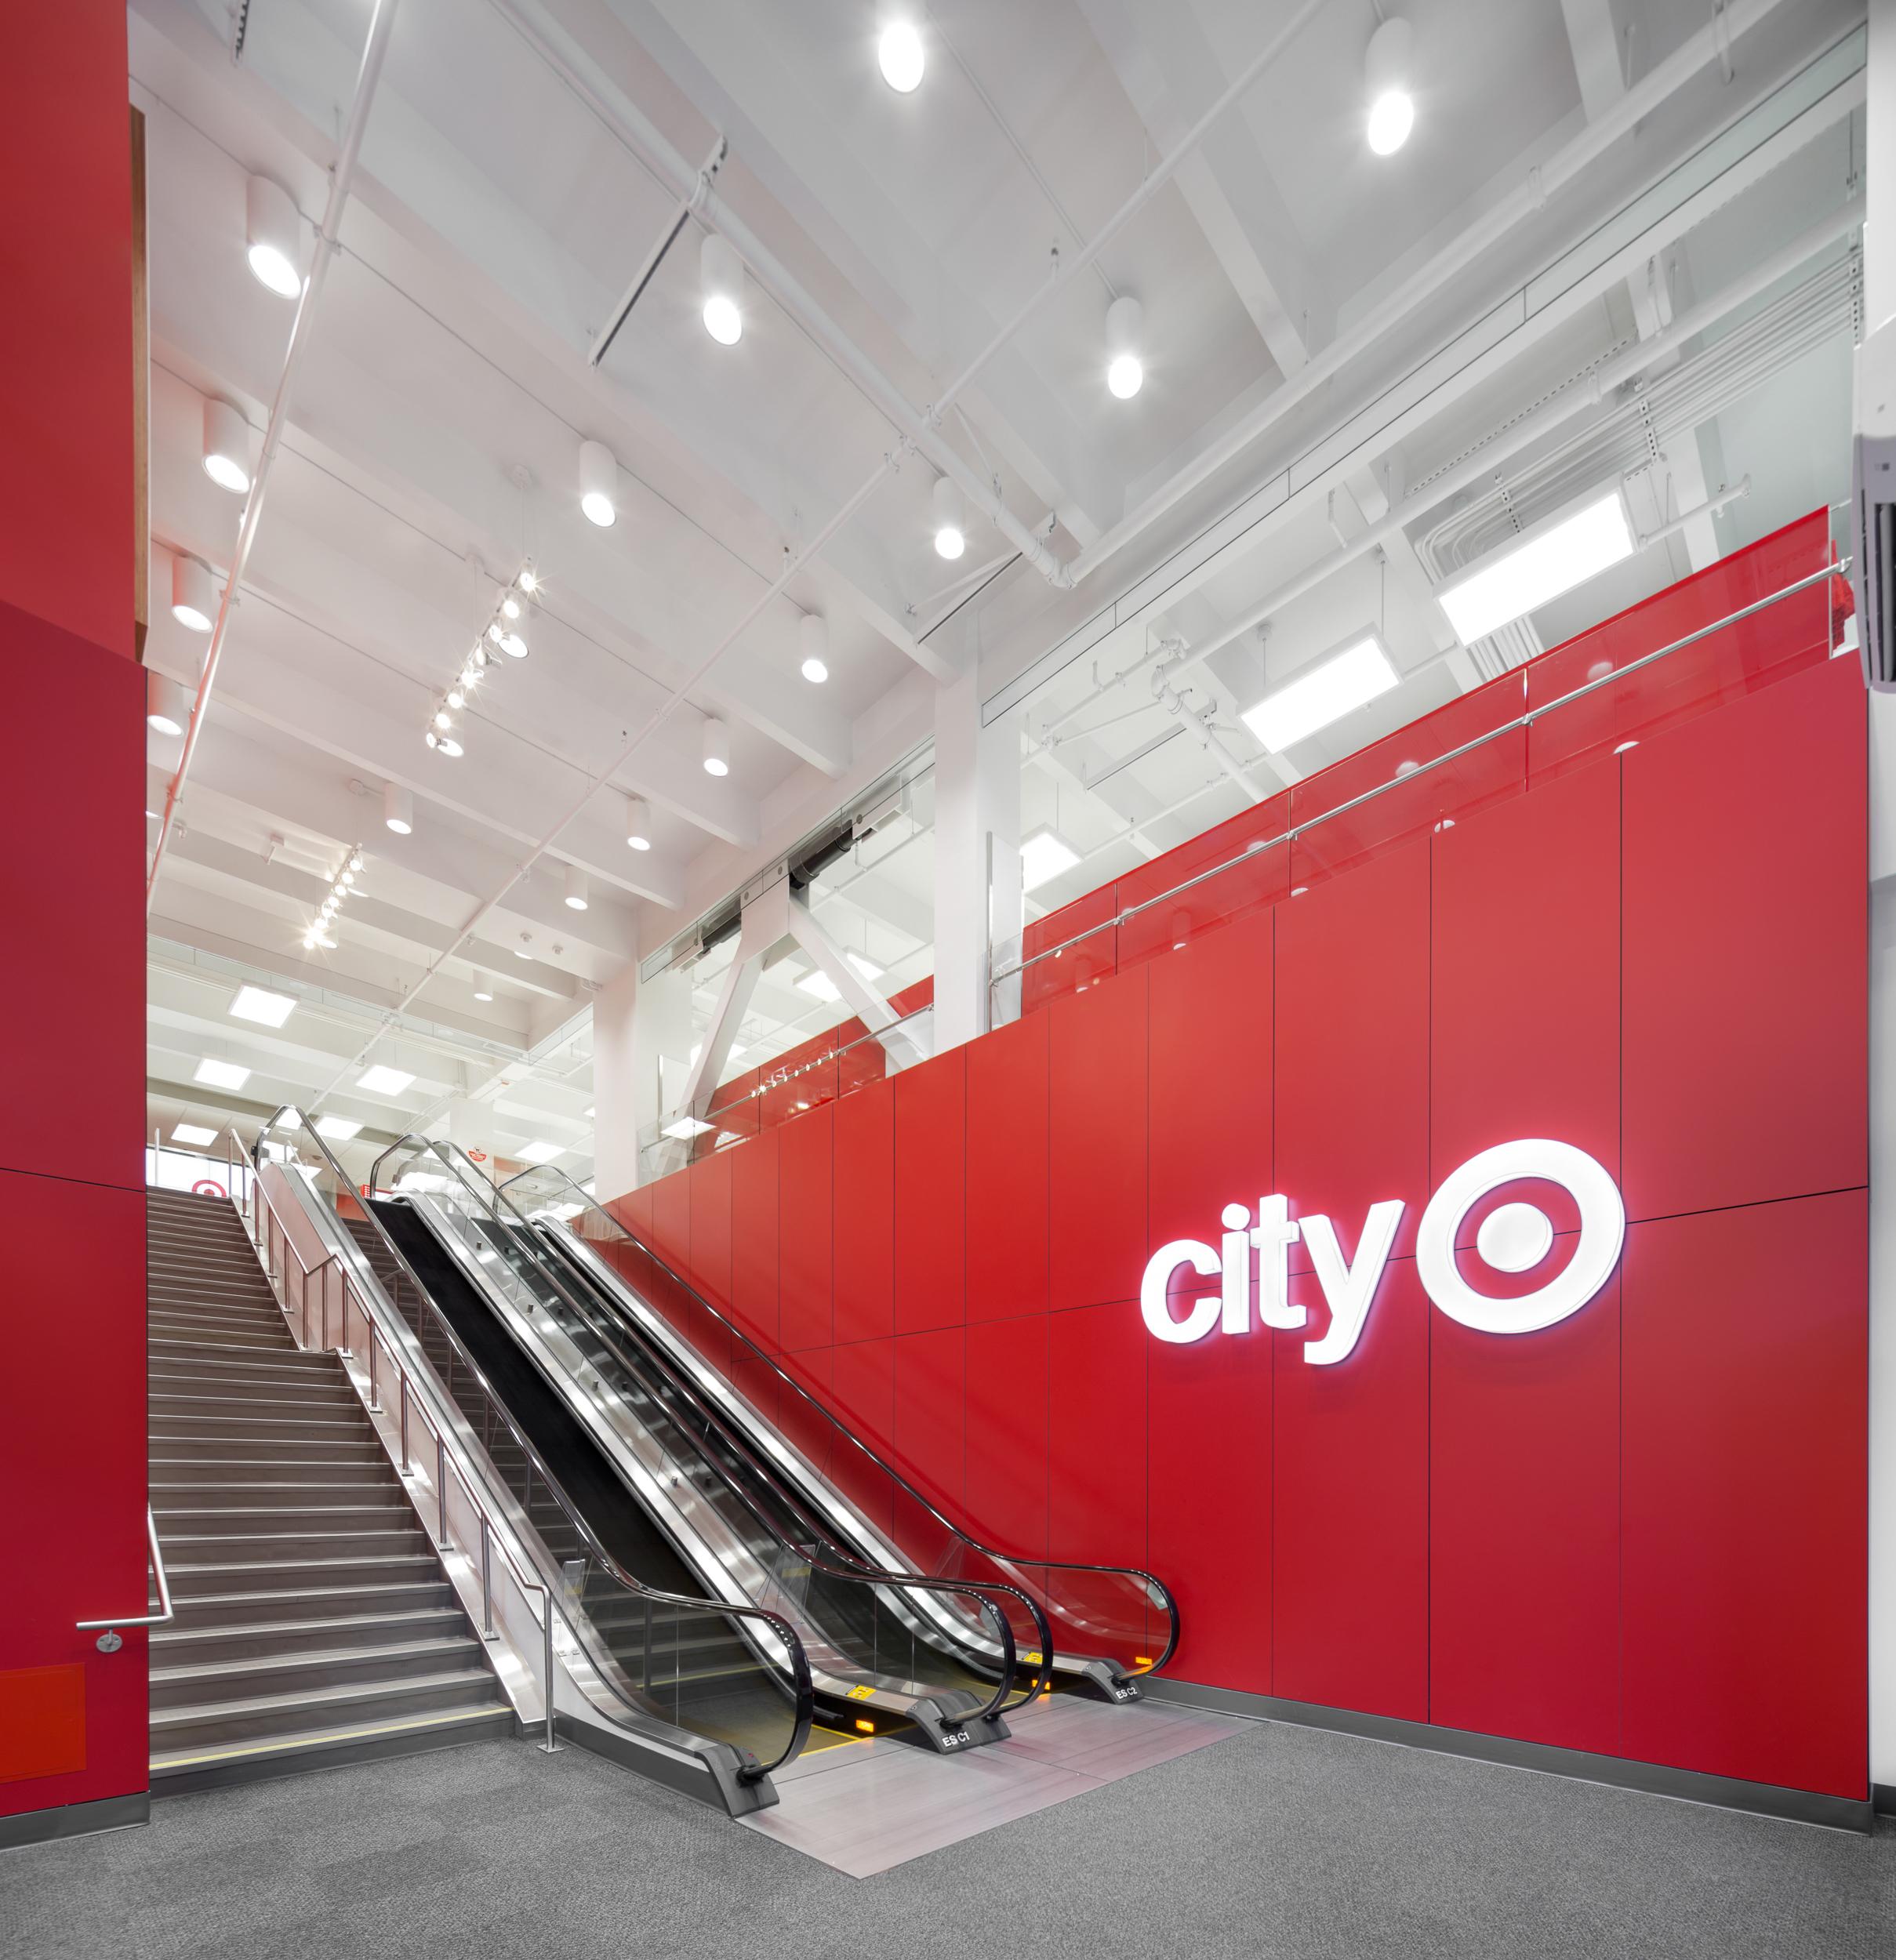 13-Galleria-JoshPartee-8563-escalator-city.jpg